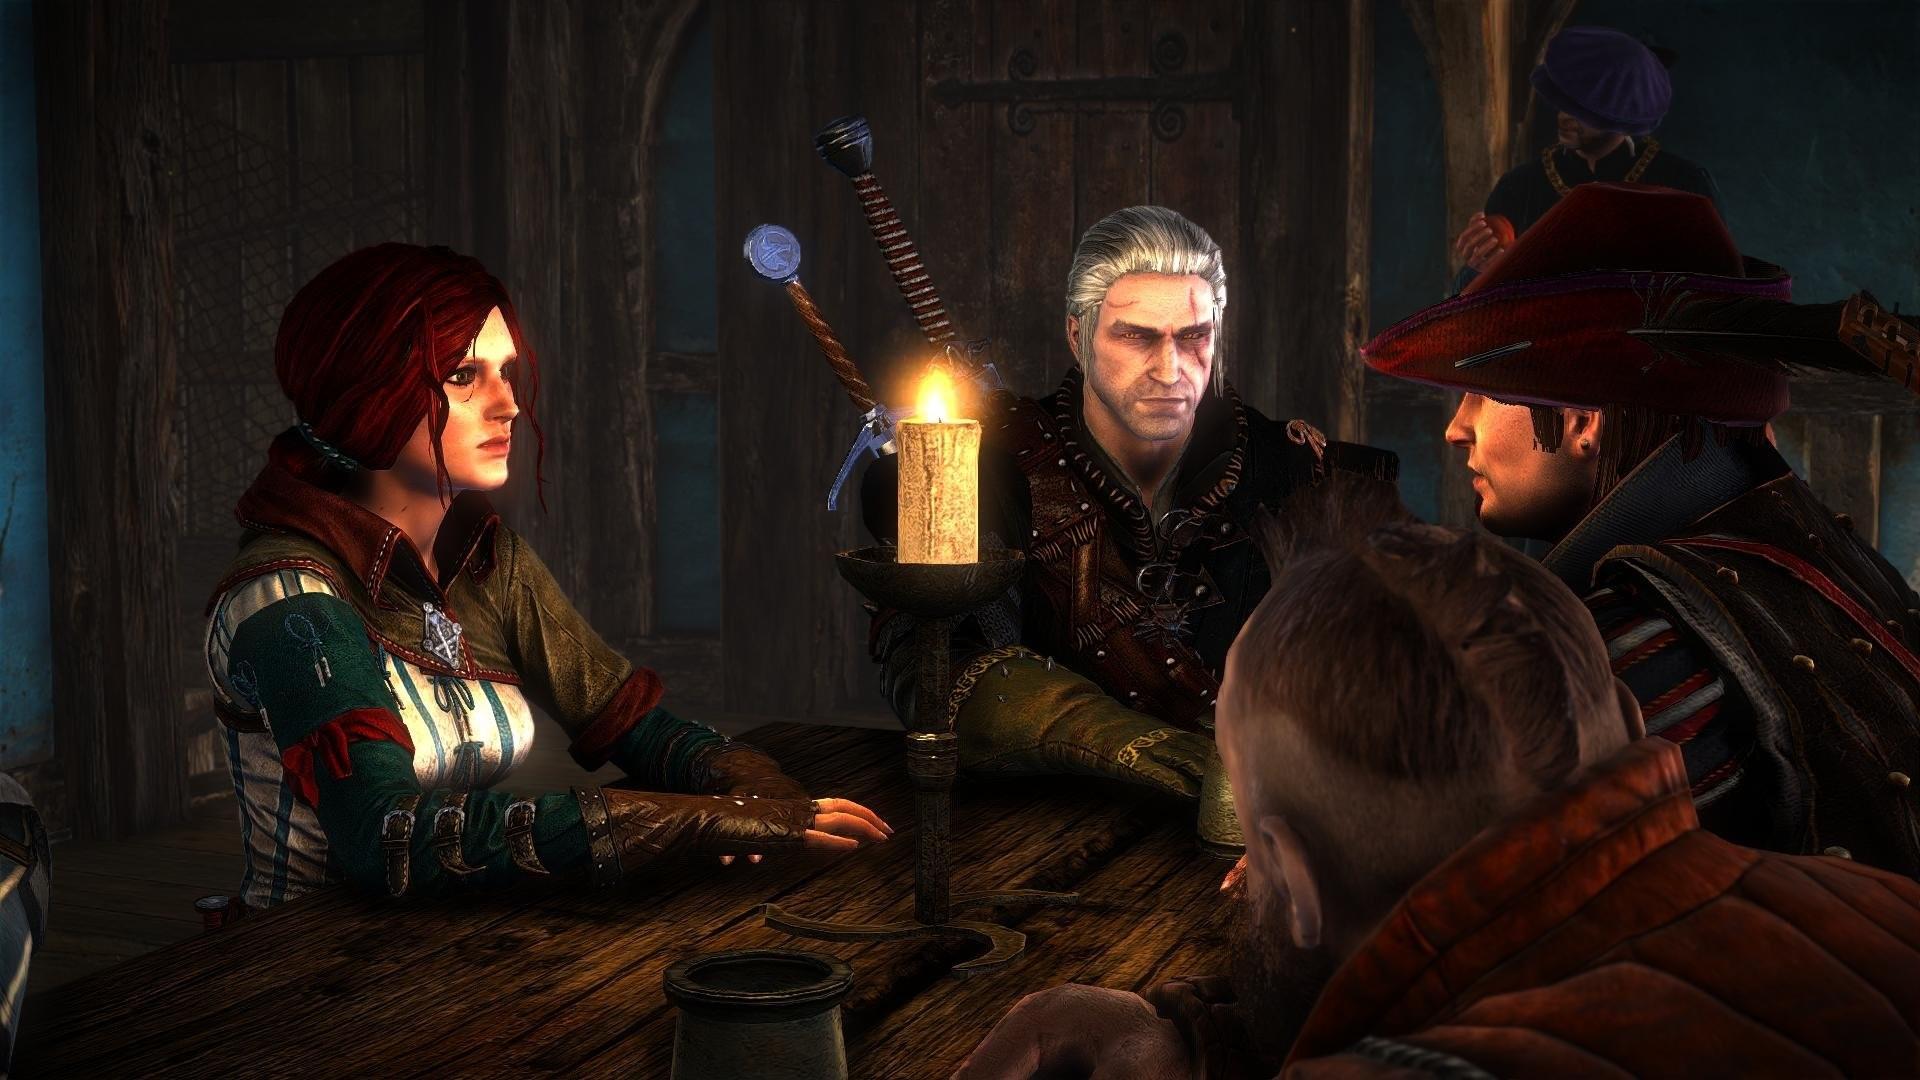 Res: 1920x1080, The Witcher 2 Assassins of Kings Dandelion Zoltan Chivay Geralt Triss  Merigold wallpaper      696593   WallpaperUP